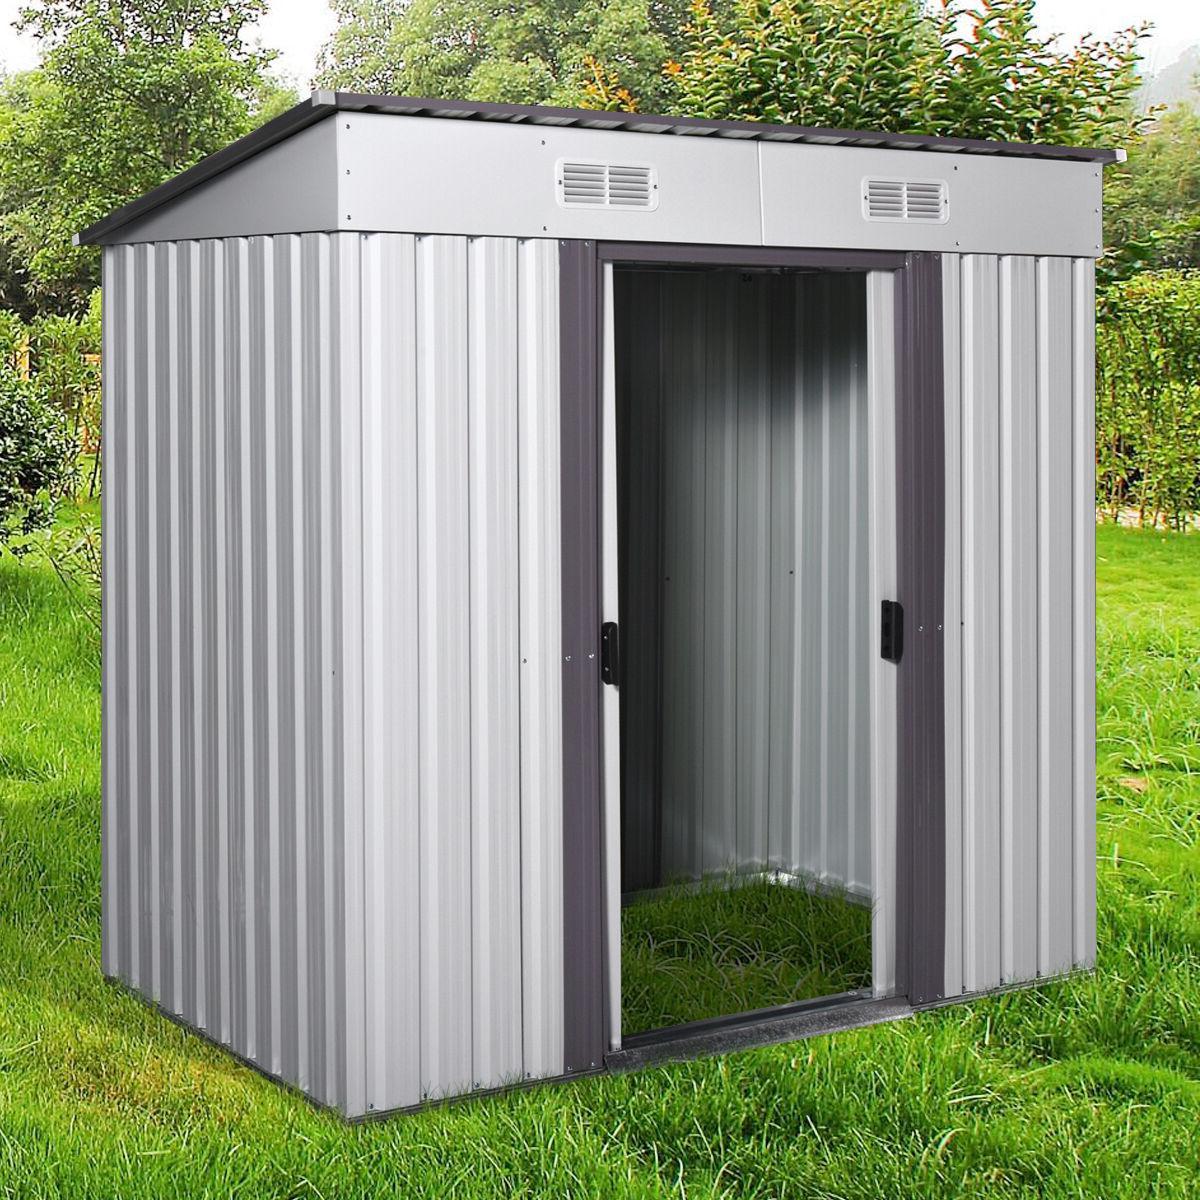 4' x 6' Outdoor Garden Storage Shed Tool House w/ Sliding Do